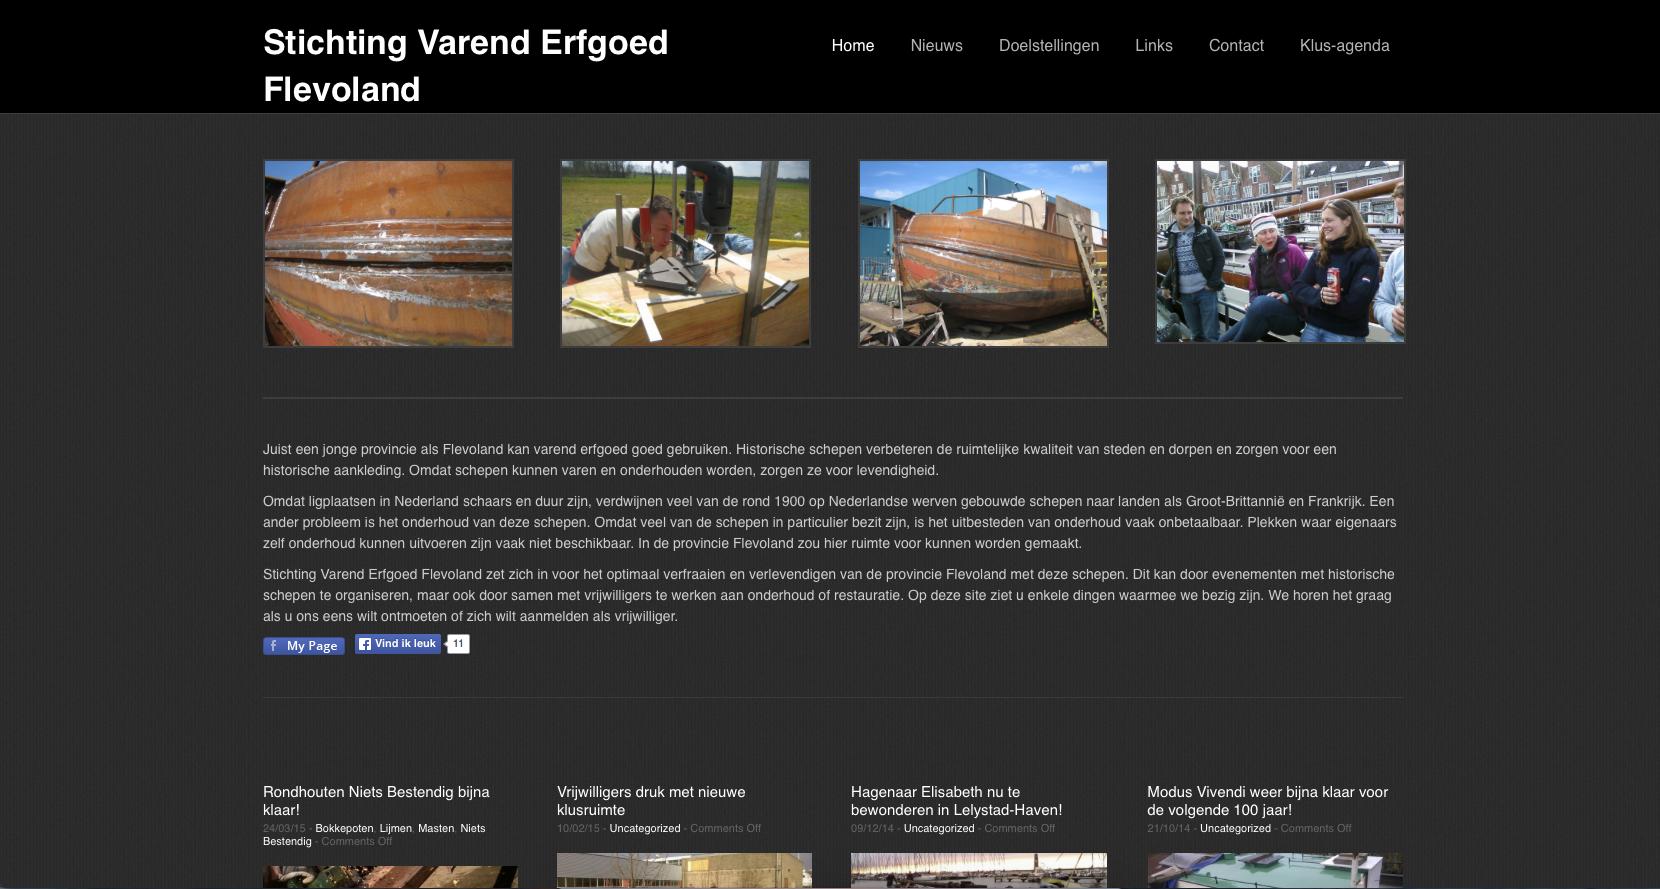 Varenderfgoedflevoland.nl